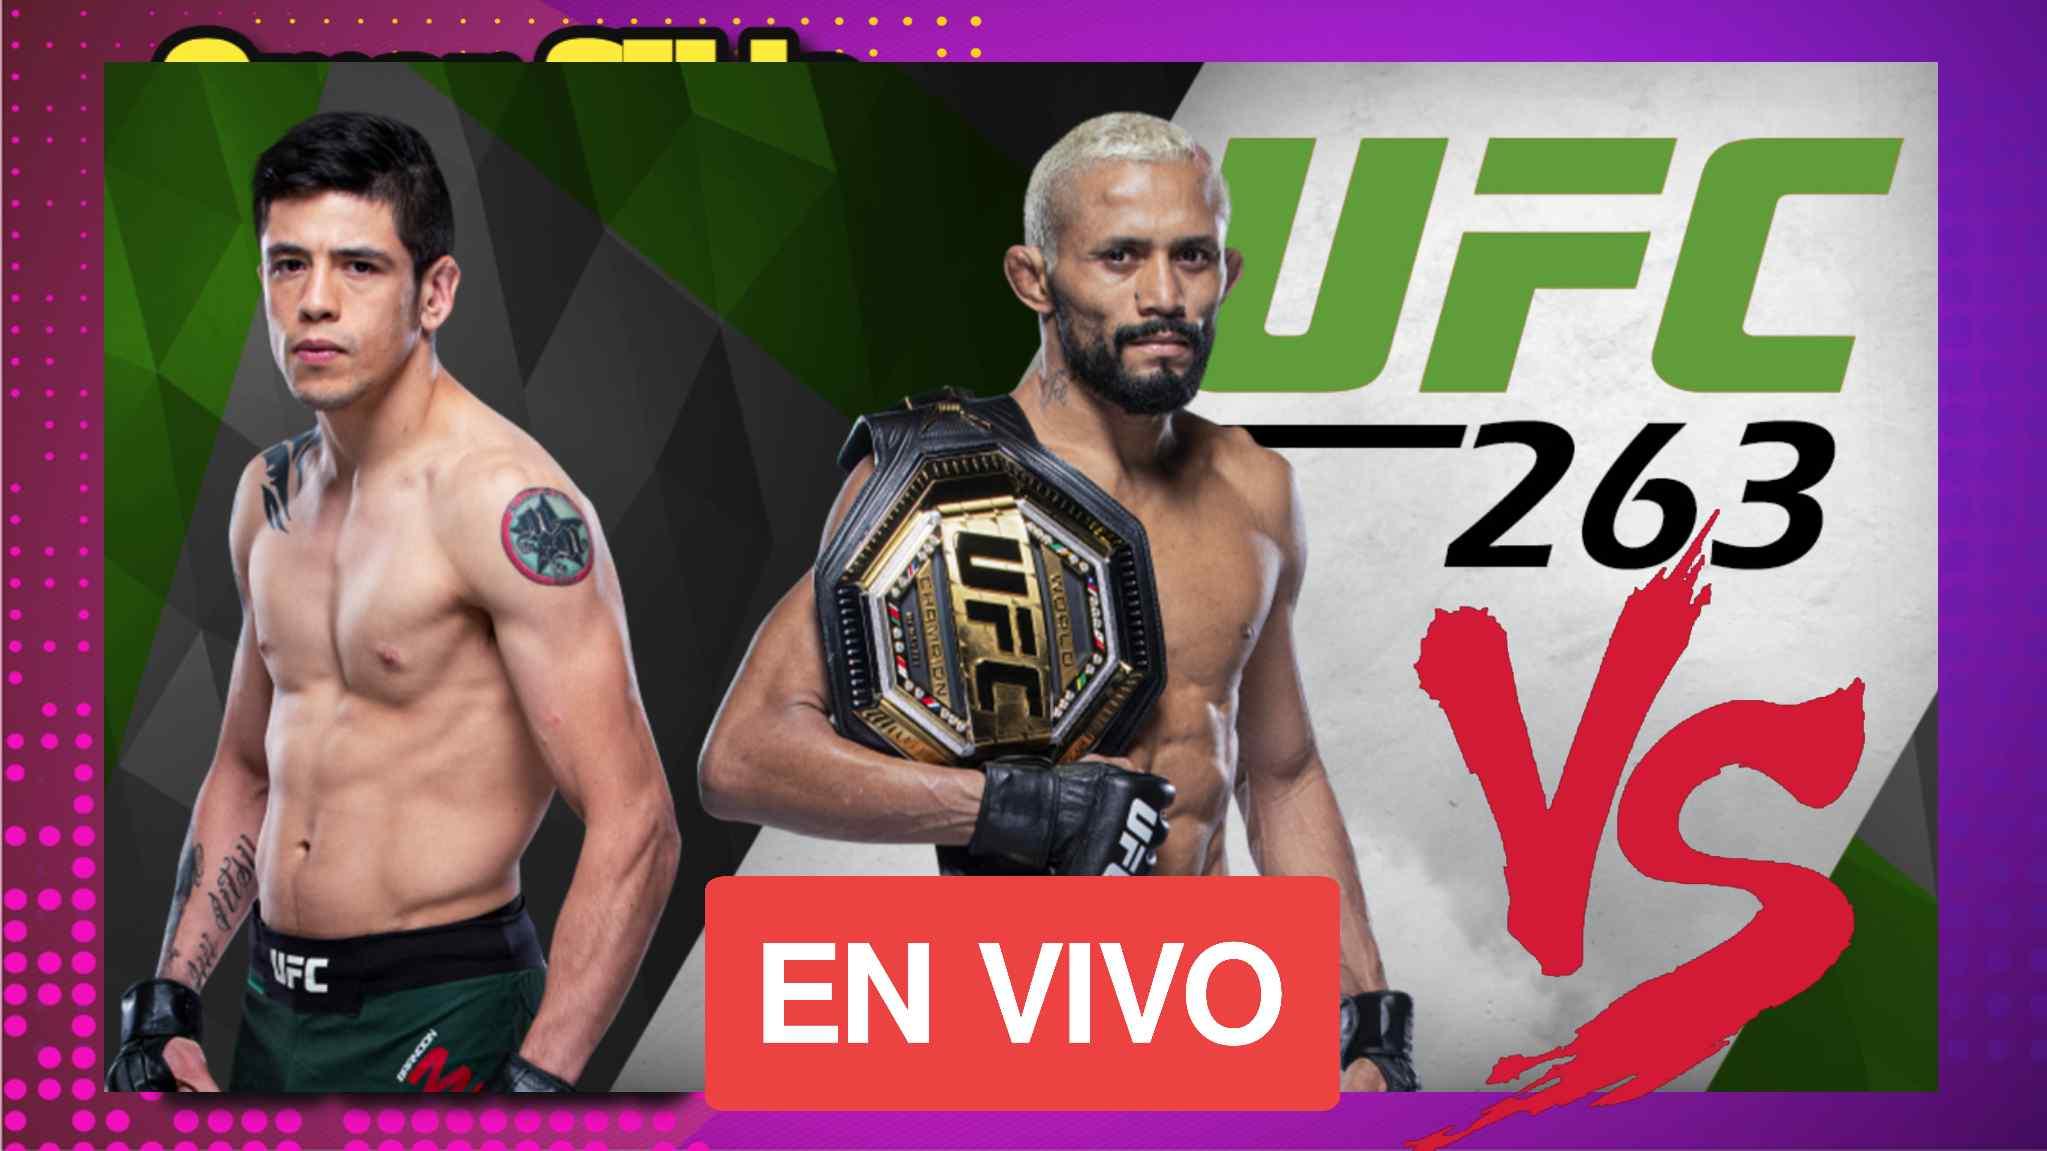 Daiveson Figueiredo VS Brandon Moreno Ver UFC 263